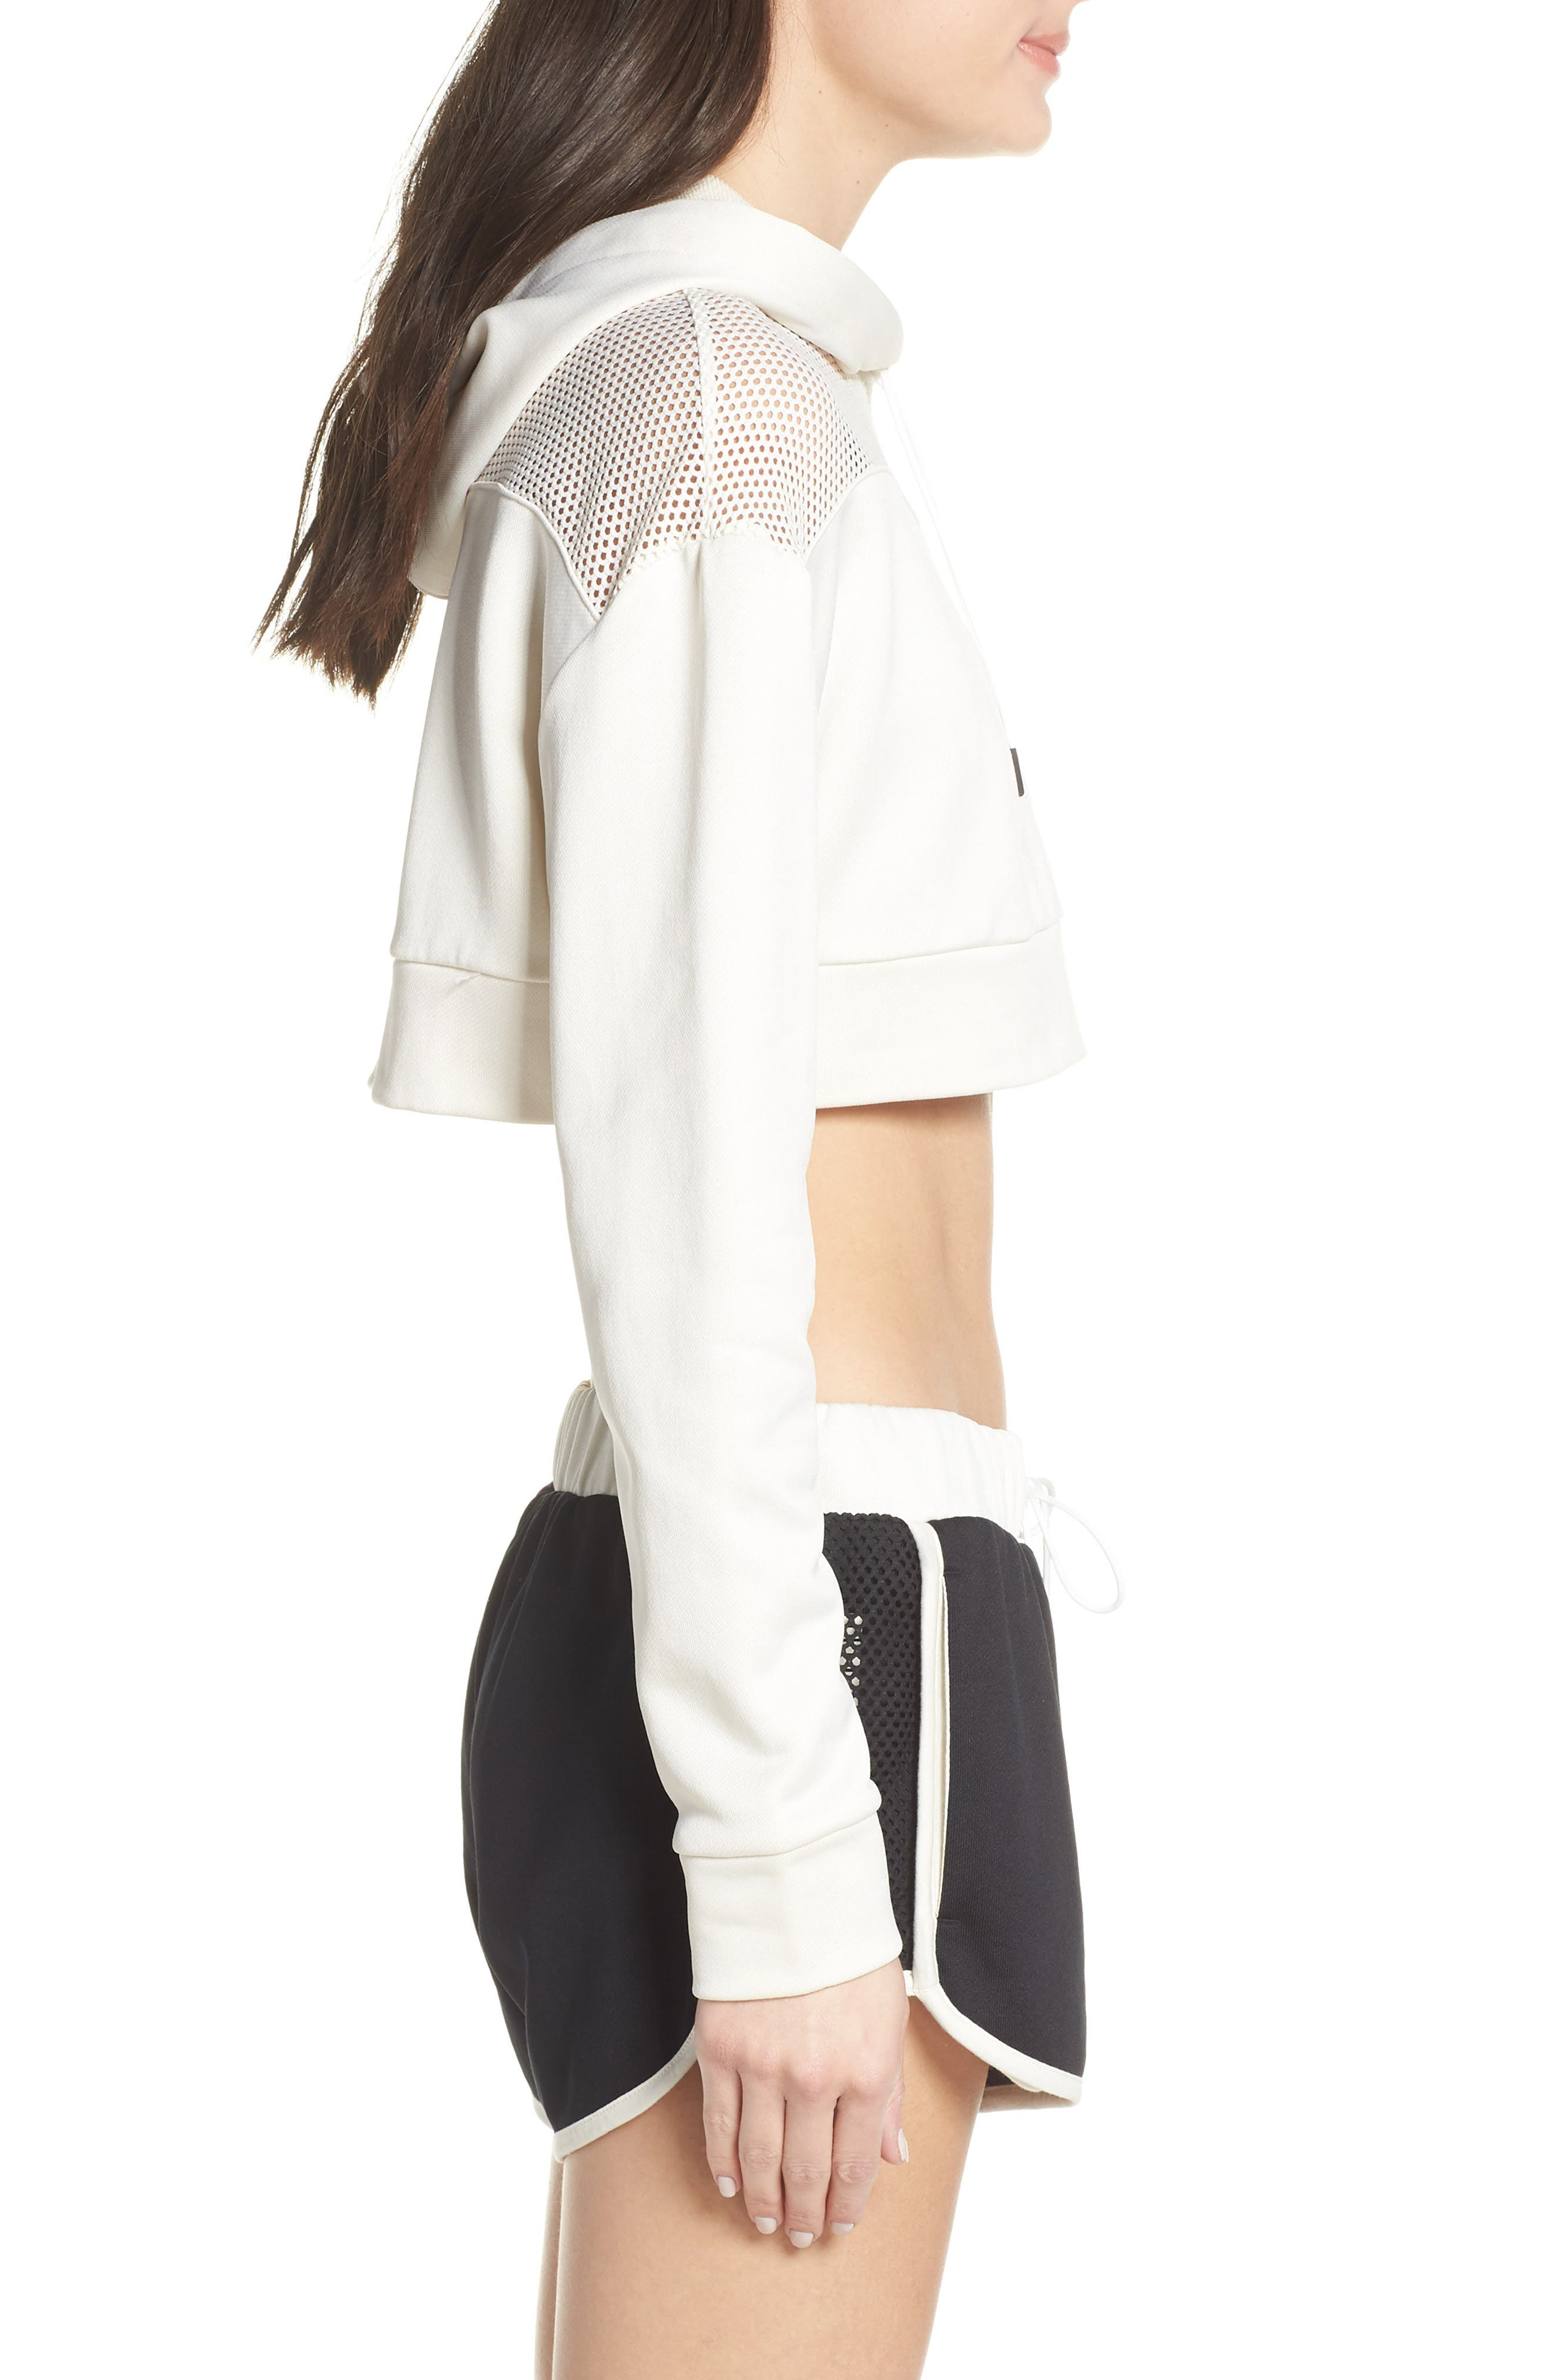 PUMA, Flourish Crop Hooded Sweatshirt, Alternate thumbnail 4, color, WHISPER WHITE-PUMA BLACK